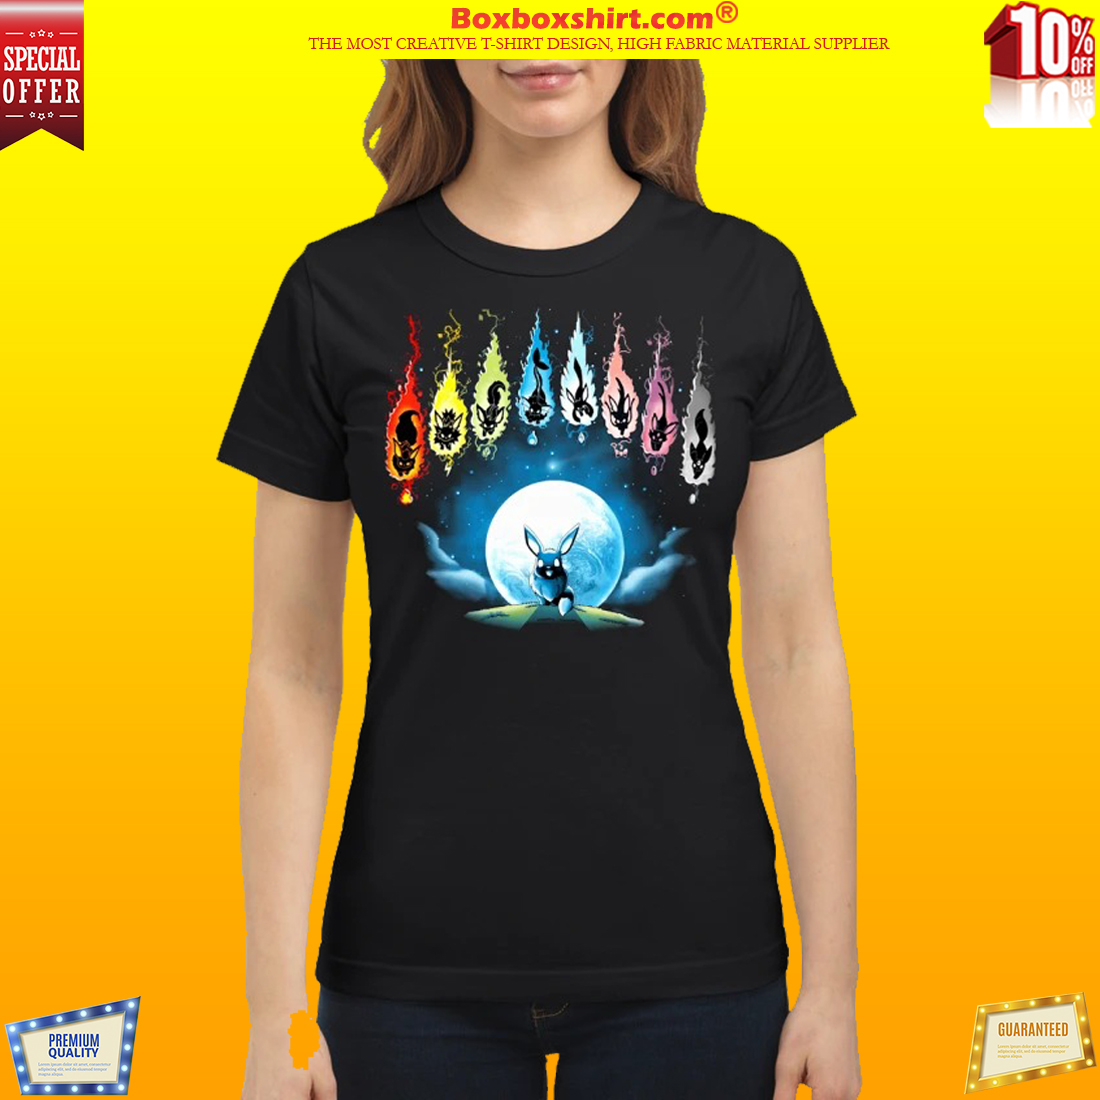 6f28417d HOTTEST] Pokemon Eevee Evolution shirt